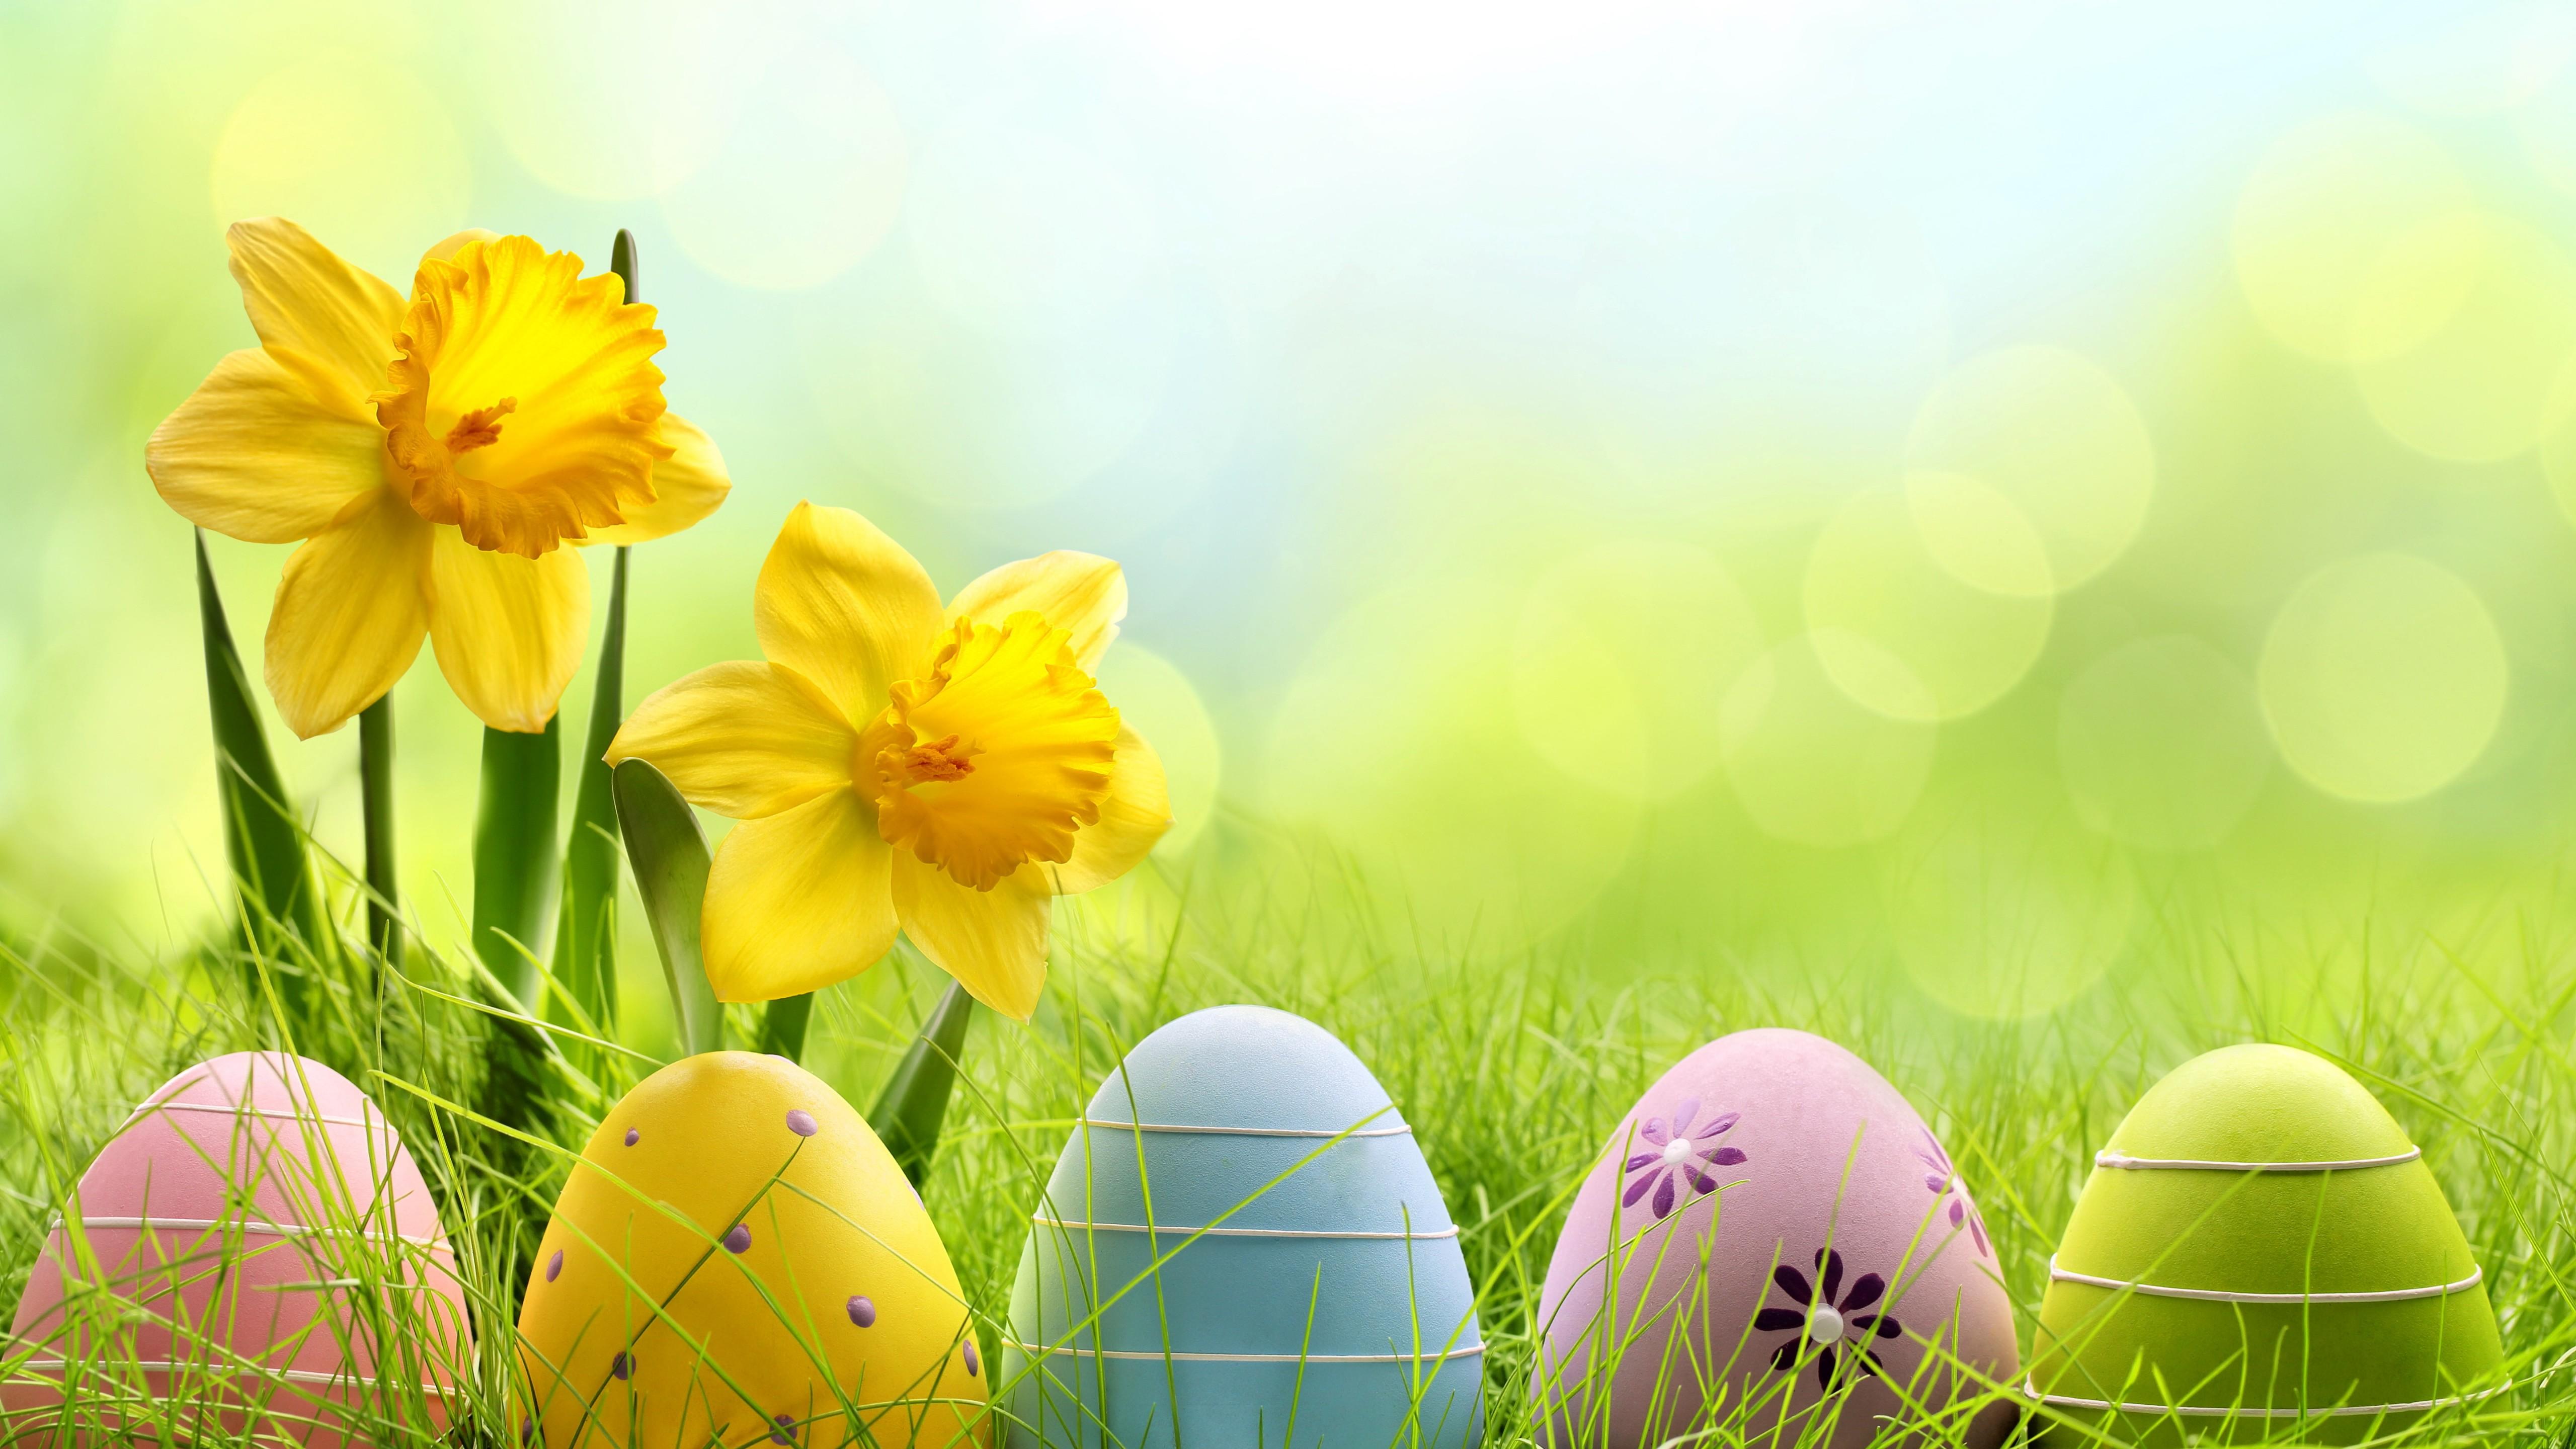 Wallpaper Easter spring flowers eggs basket Holidays 4127 5120x2880